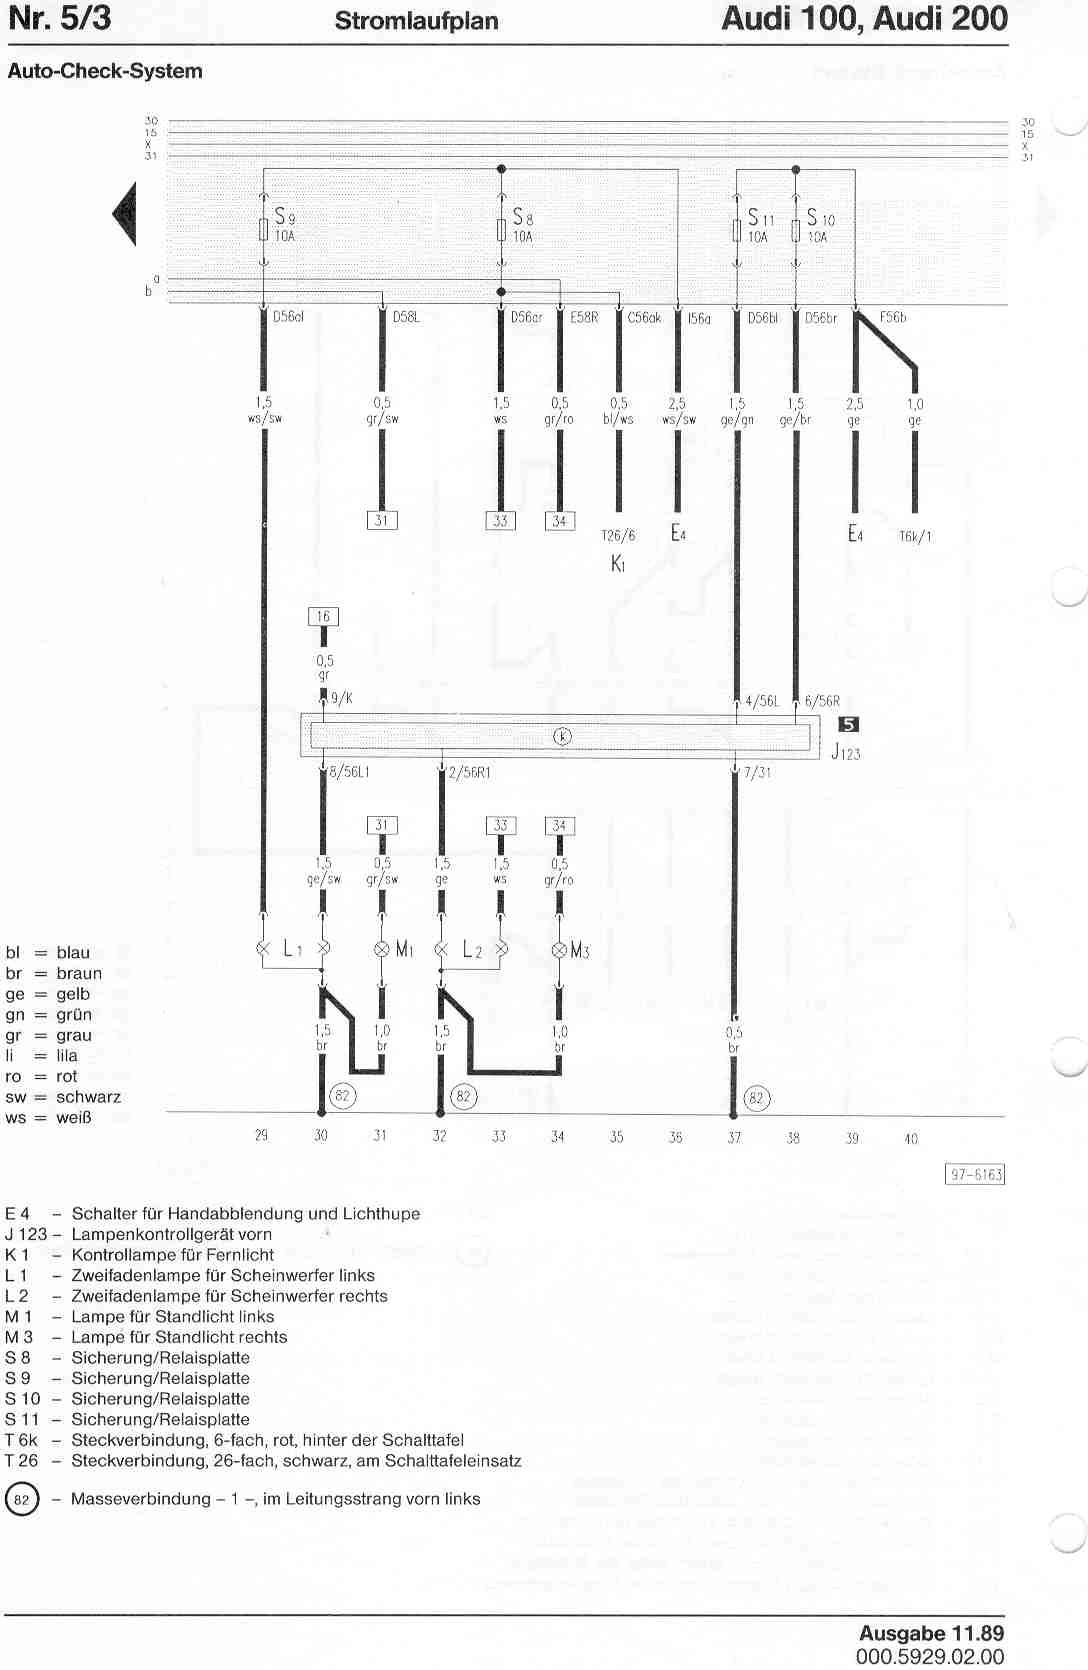 audi 100 c4 wiring diagram toyota land cruiser radio 200 factory diagrams